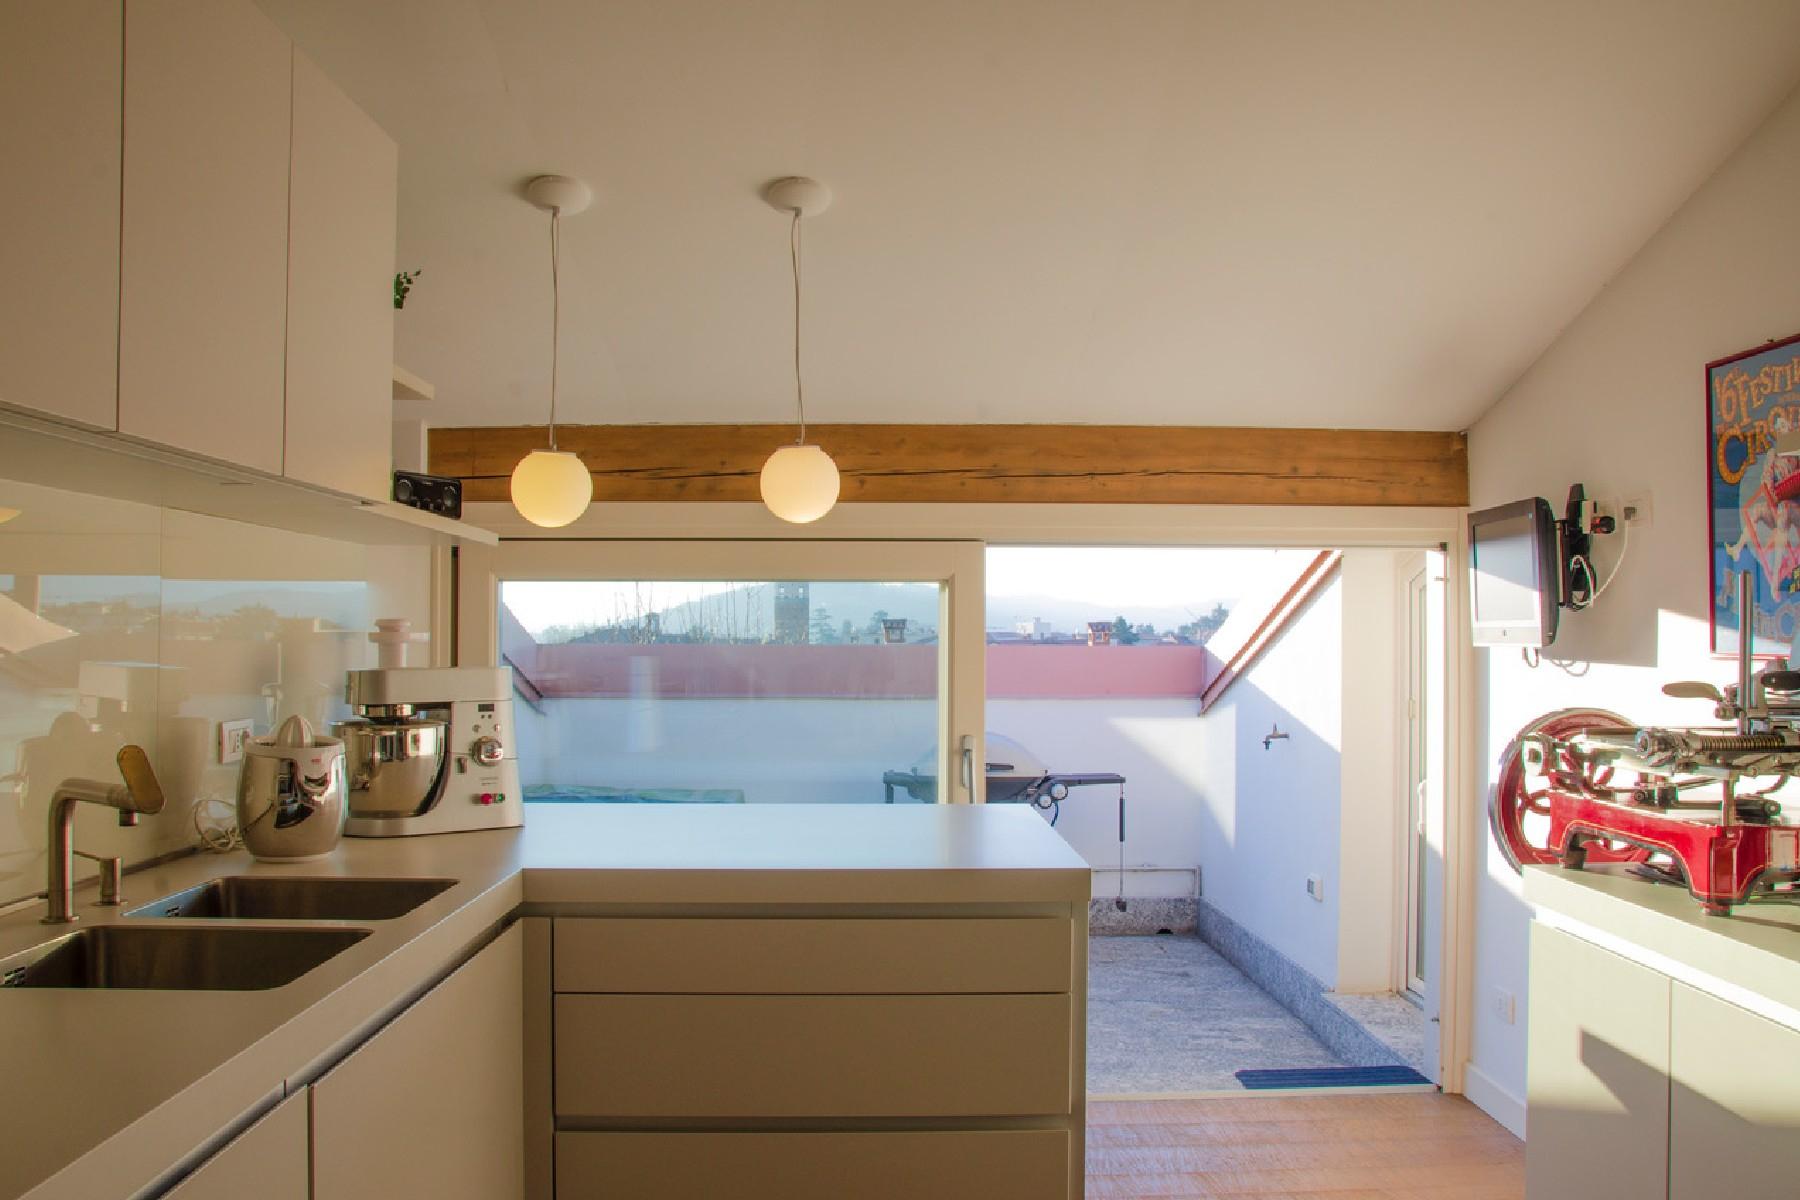 Appartamento in Vendita a Merate: 4 locali, 225 mq - Foto 7